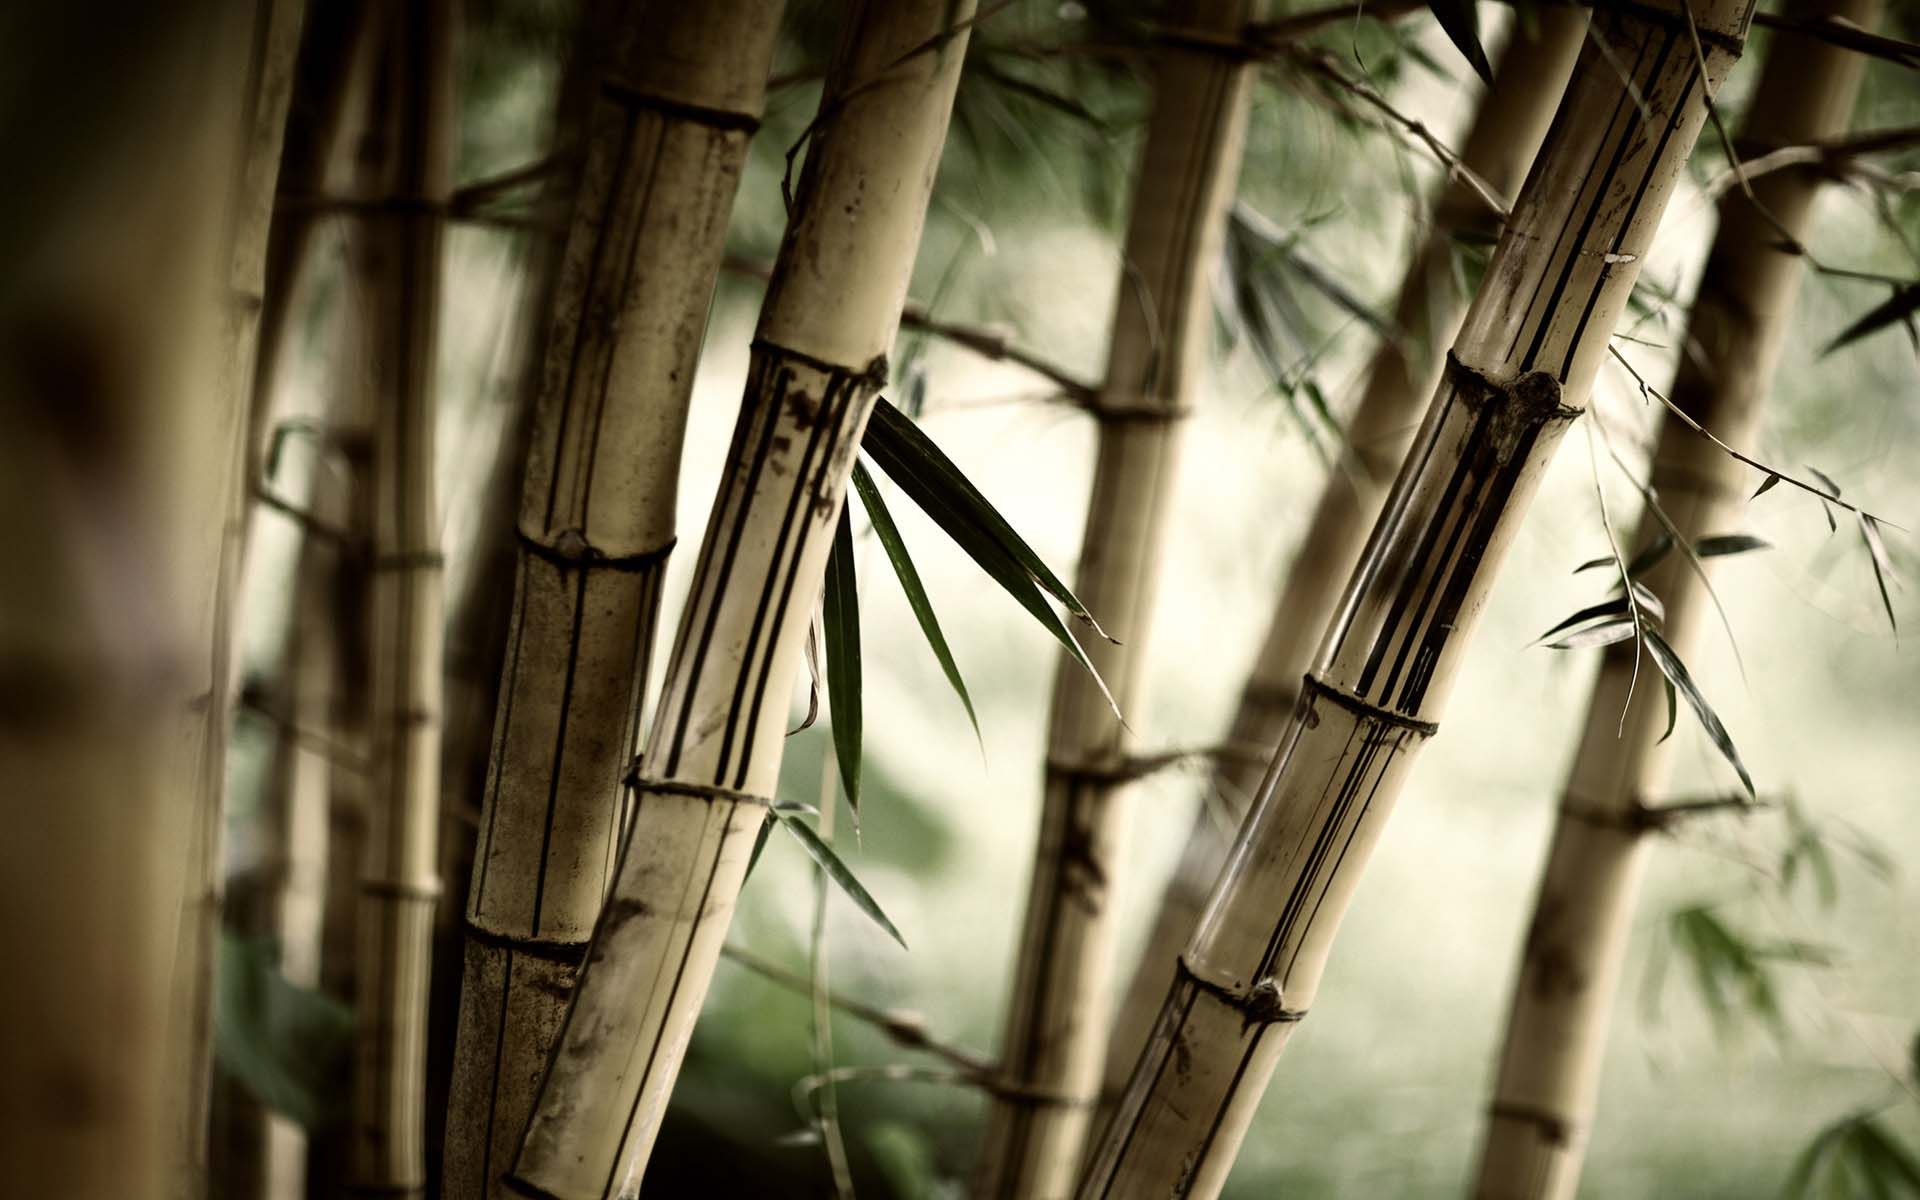 Bamboo Tree Closeup Wallpaper - Old Bamboo - HD Wallpaper